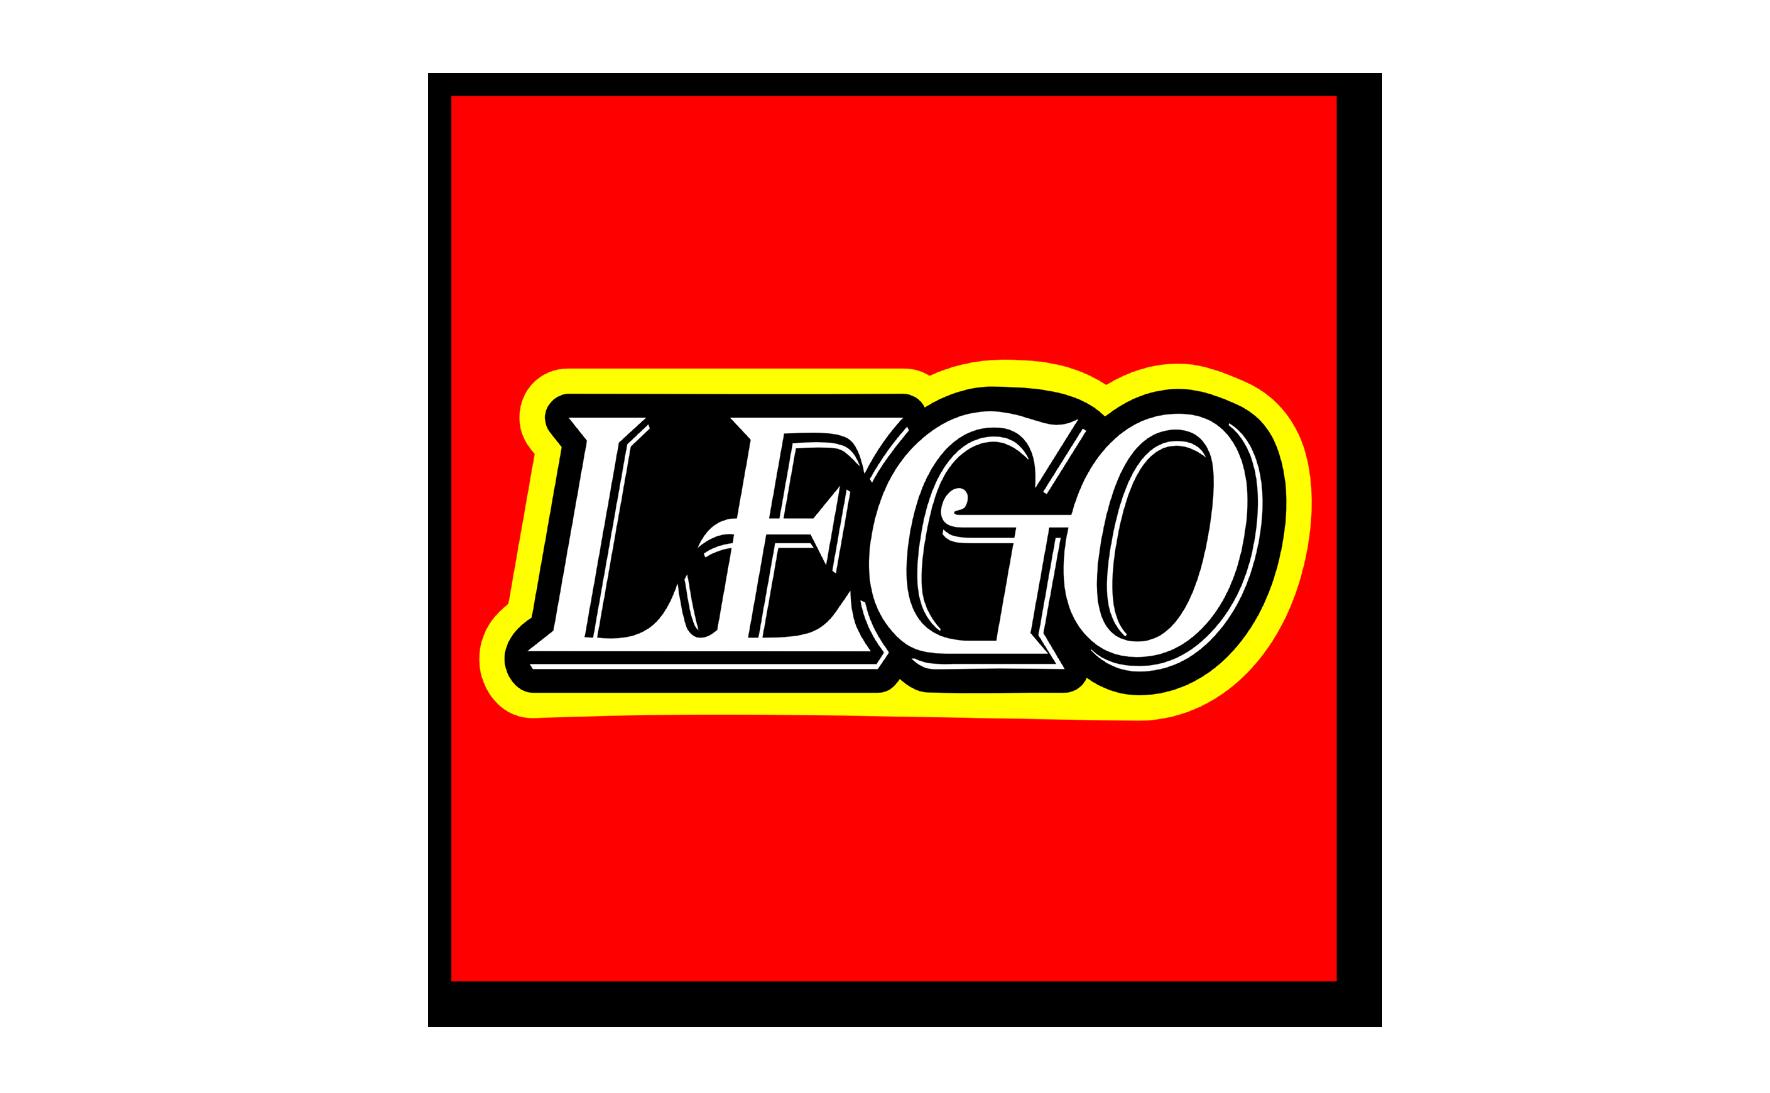 Legos clipart alphabet. Images of lego logo